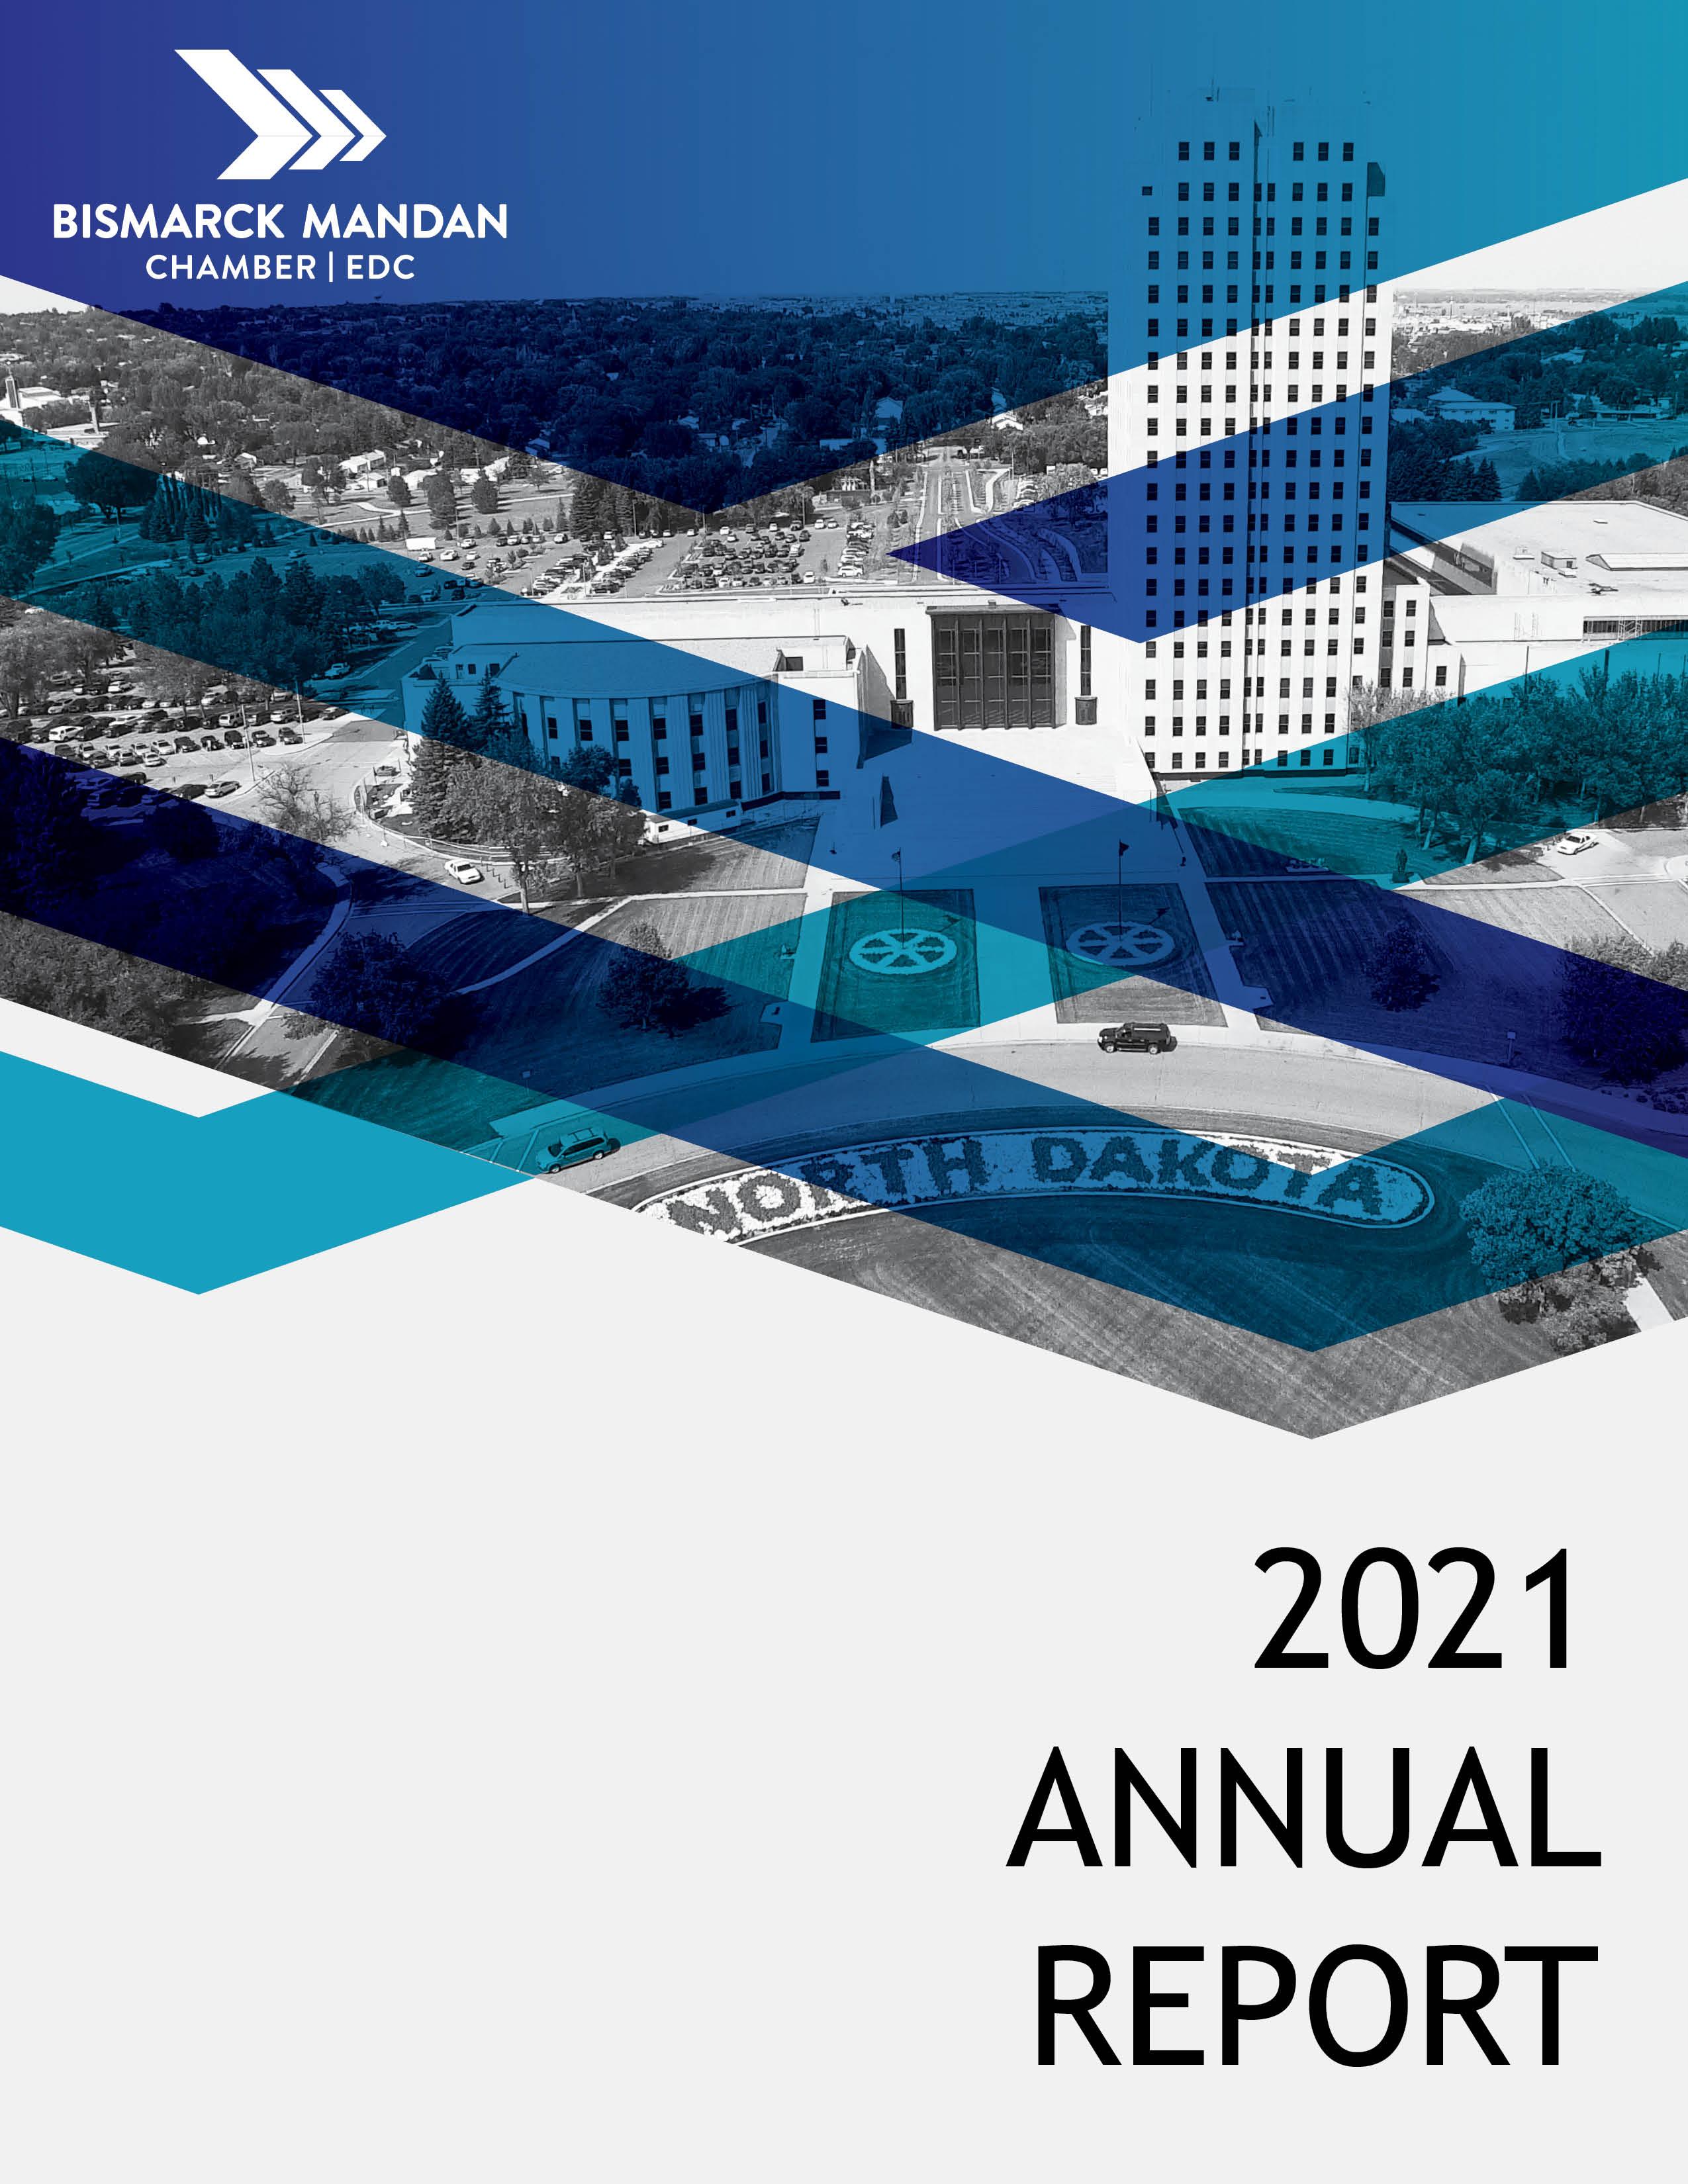 2021 Annual Report 2_Cover